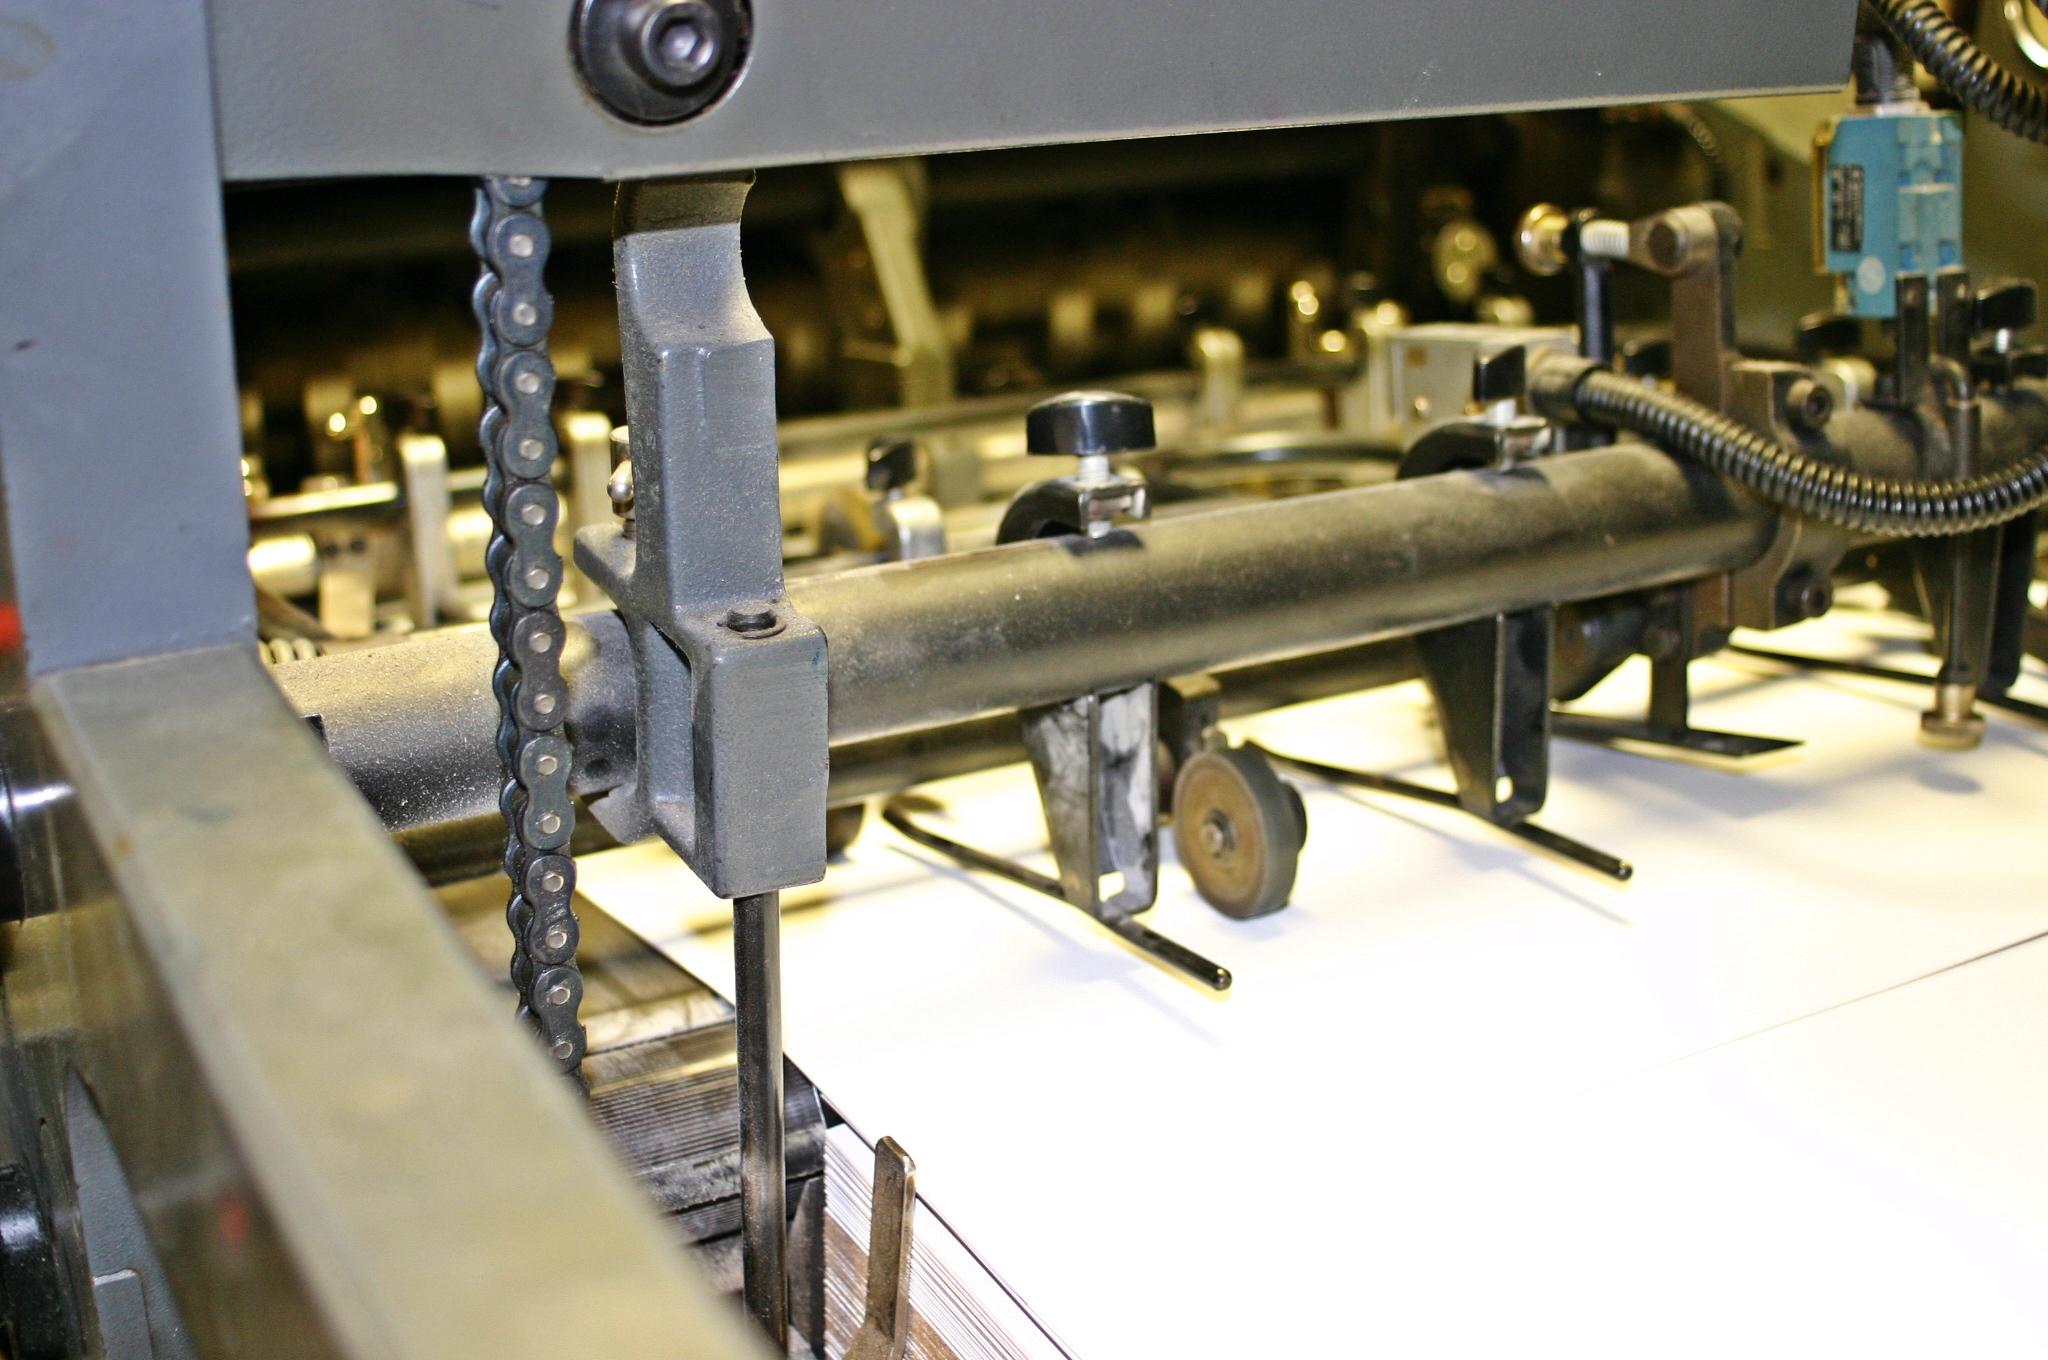 Pre-press print production